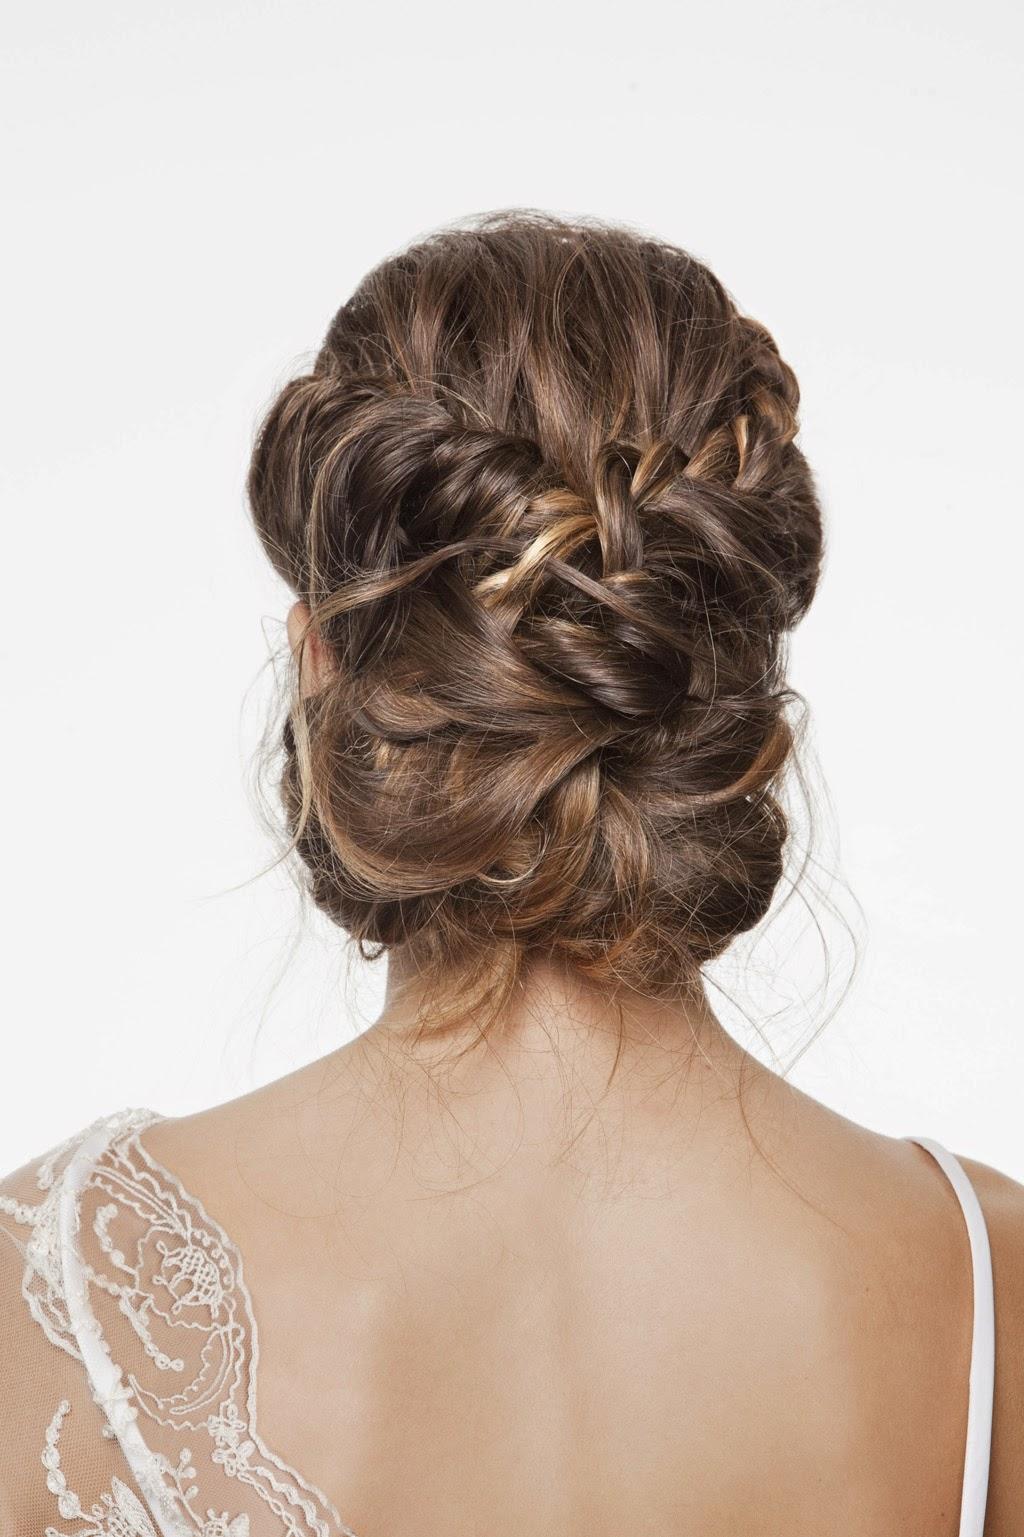 Tipos de recogidos para novias mis secretos de boda events - Recogido para boda ...